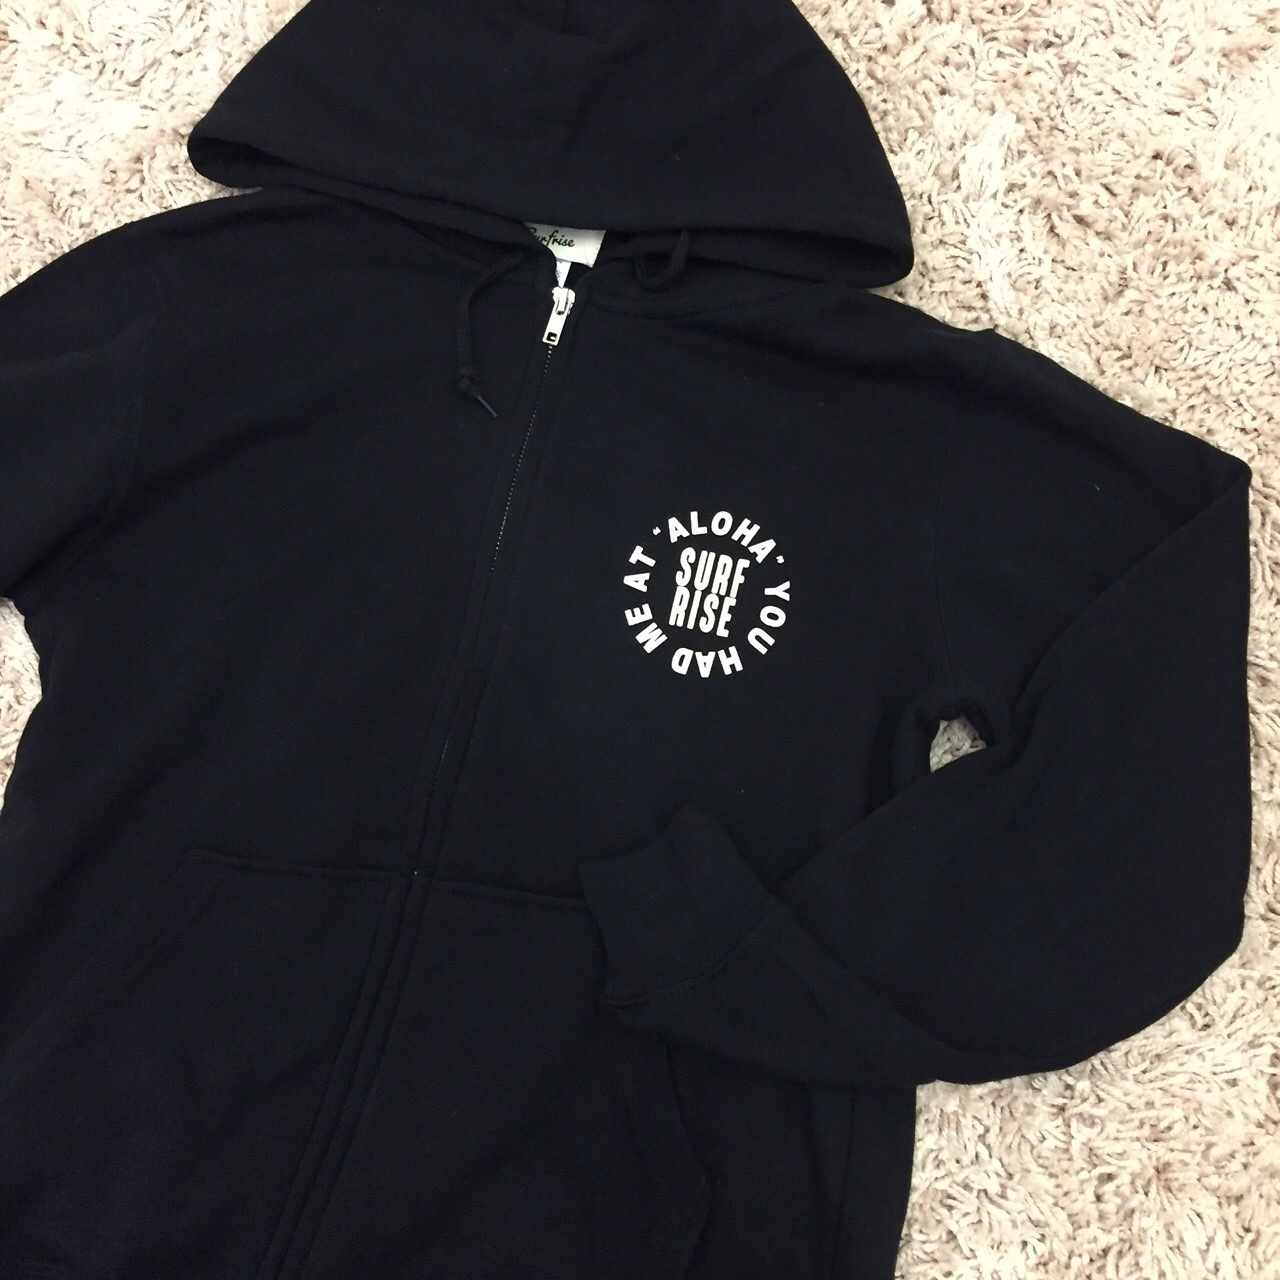 ★Kids★ALOHA zip - Black